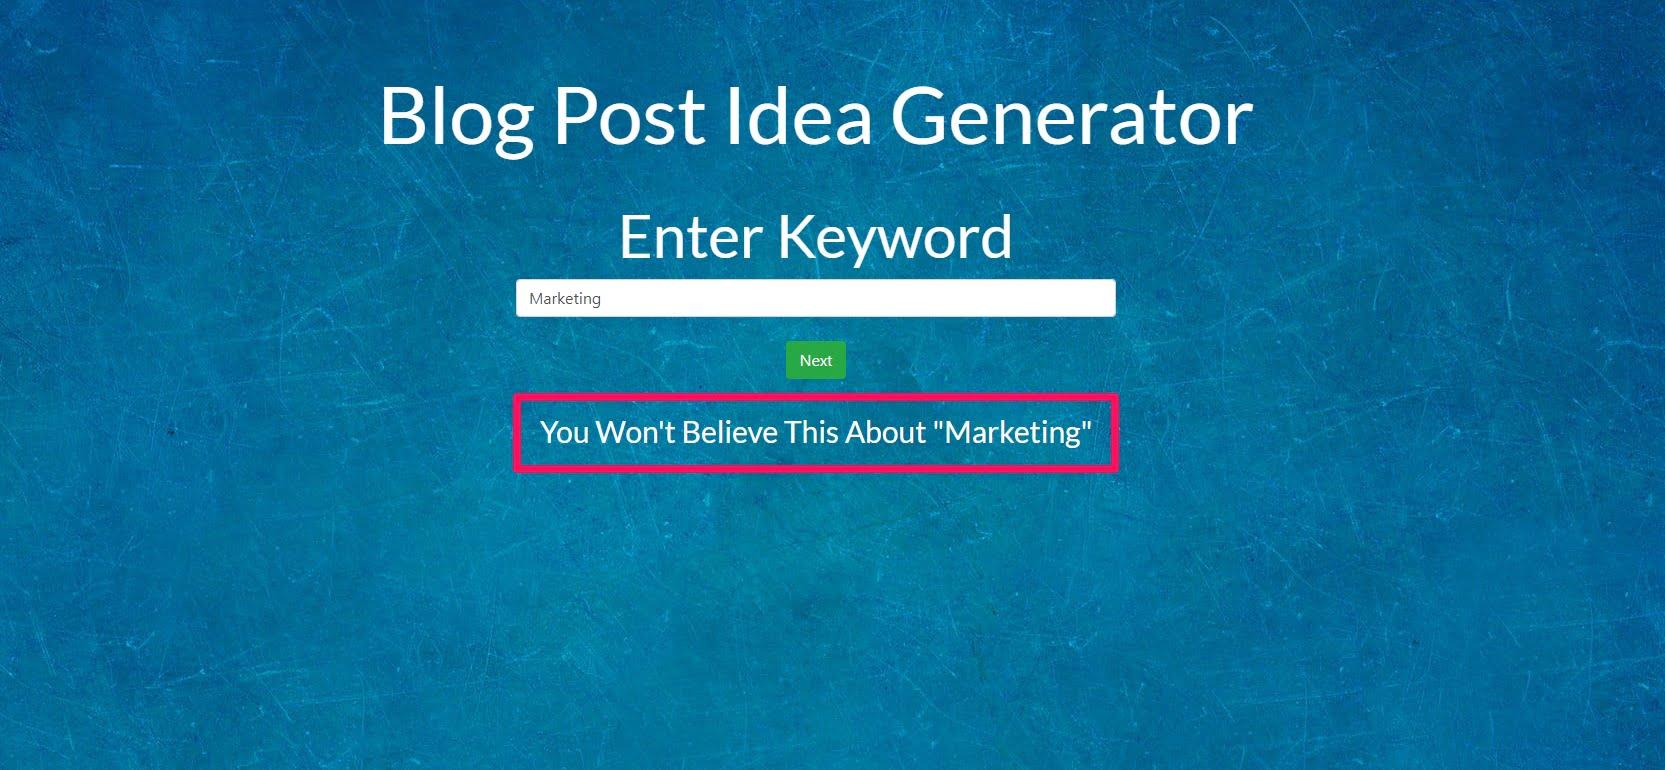 My blog post idea generator tool results